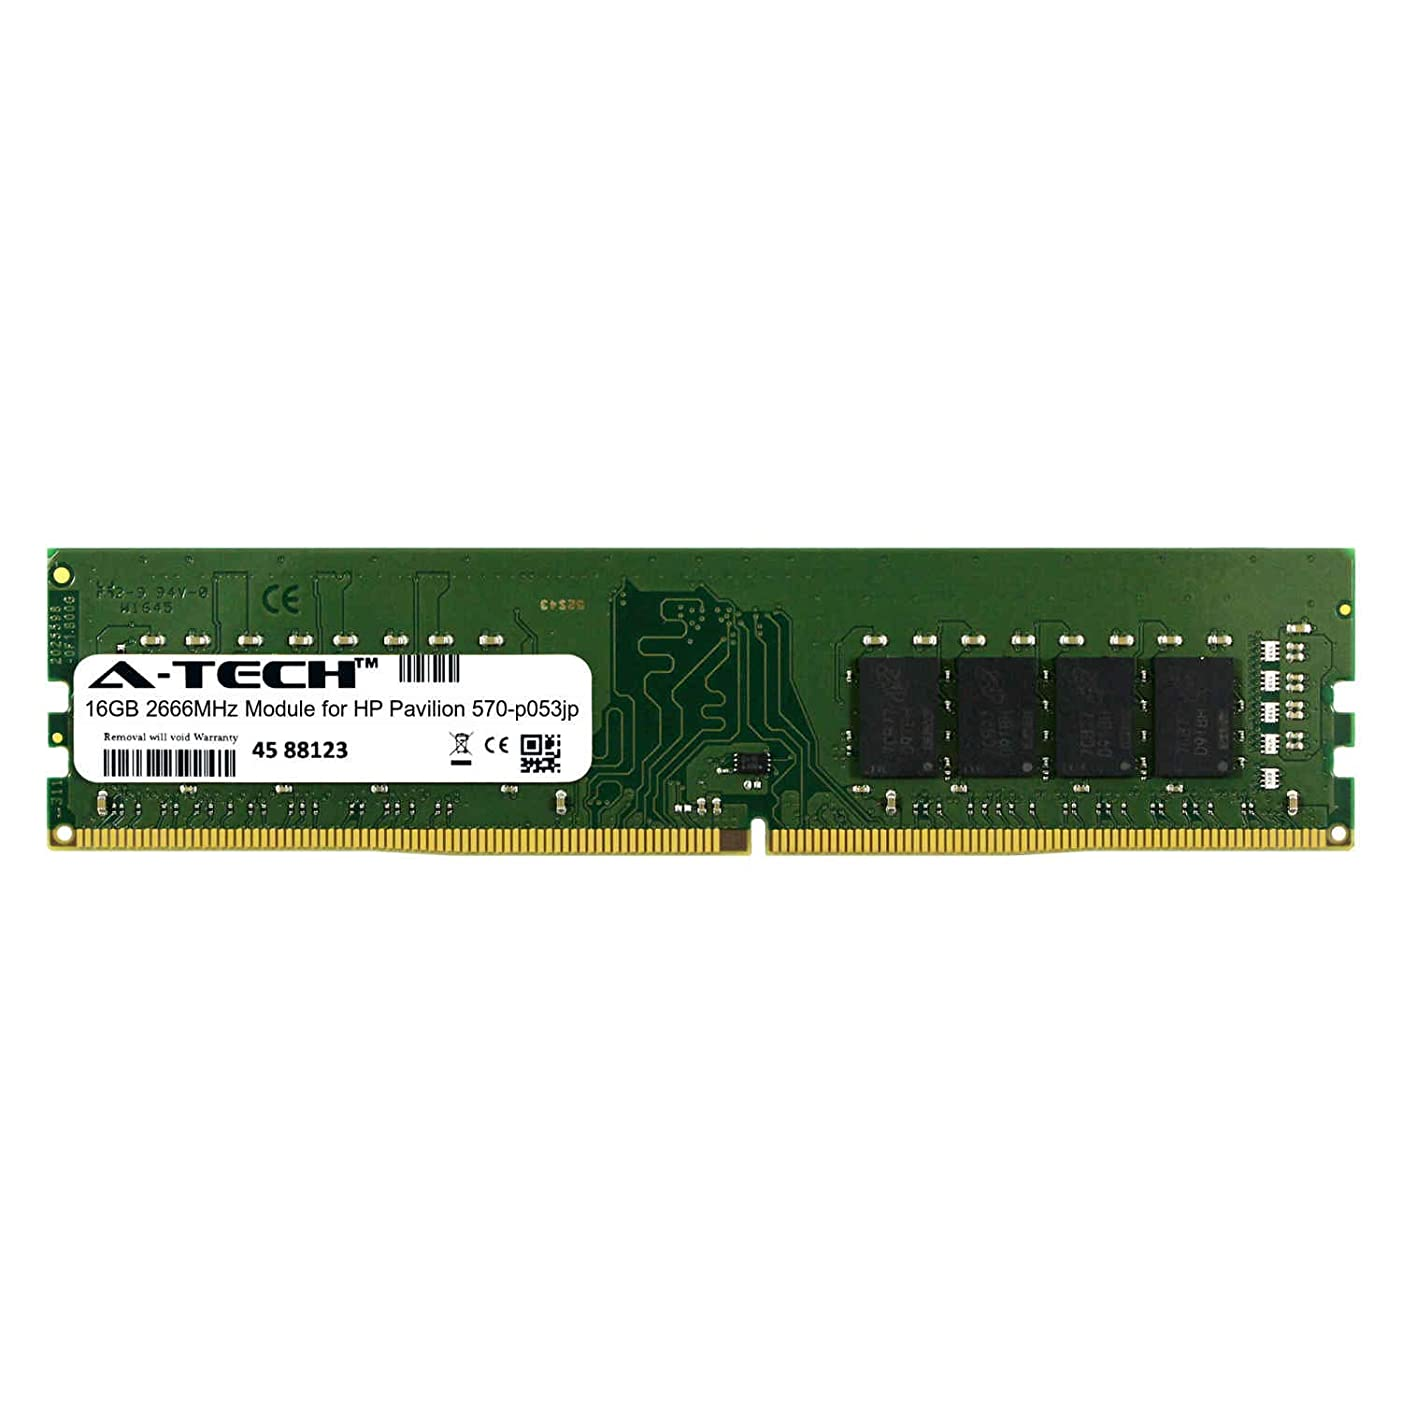 A-Tech 16GB Module for HP Pavilion 570-p053jp Desktop & Workstation Motherboard Compatible DDR4 2666Mhz Memory Ram (ATMS311083A25823X1)